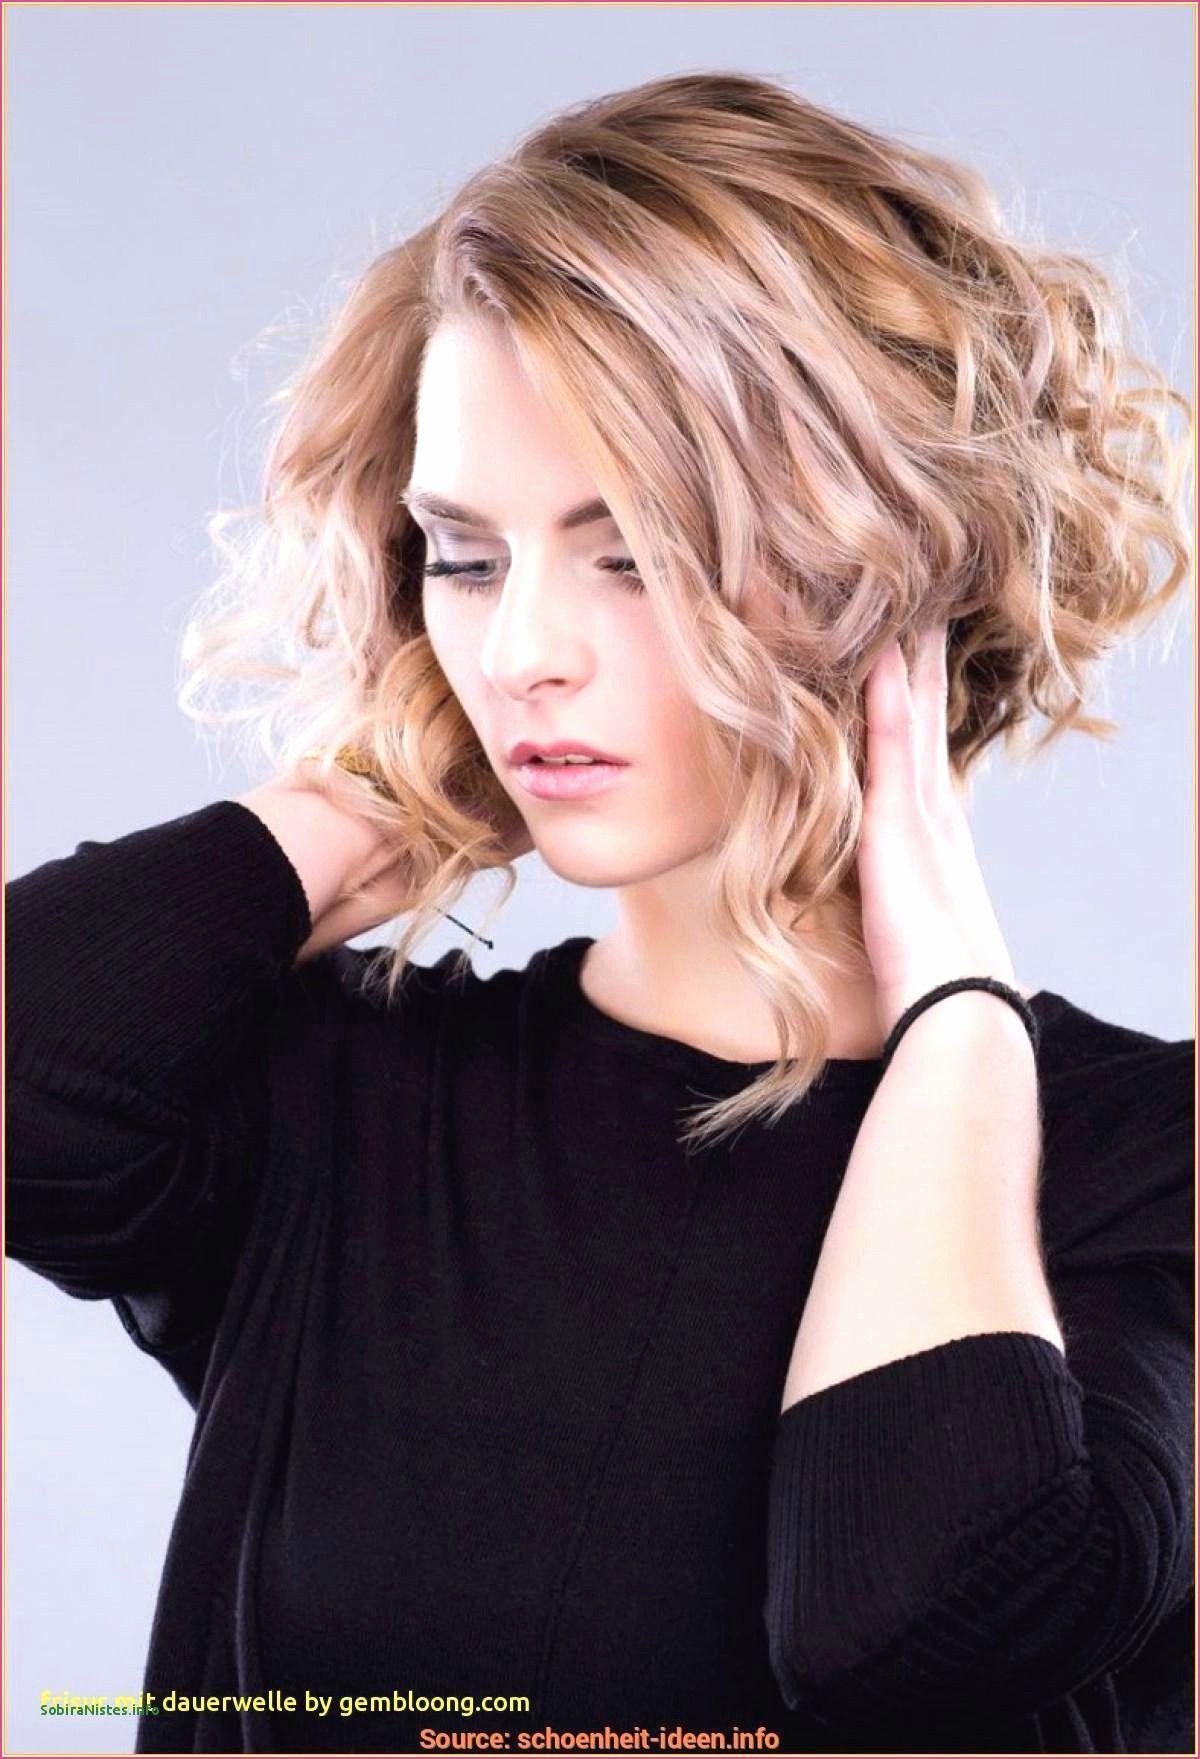 Frisuren Ab 60 Mit Brille Frisuren Ab 60 Mit Brille Frisuren Ab 60 Mit Bri Frisuren Ab 60 Mit Brill In 2020 Bob Hairstyles Curly Hair Styles Hair Styles